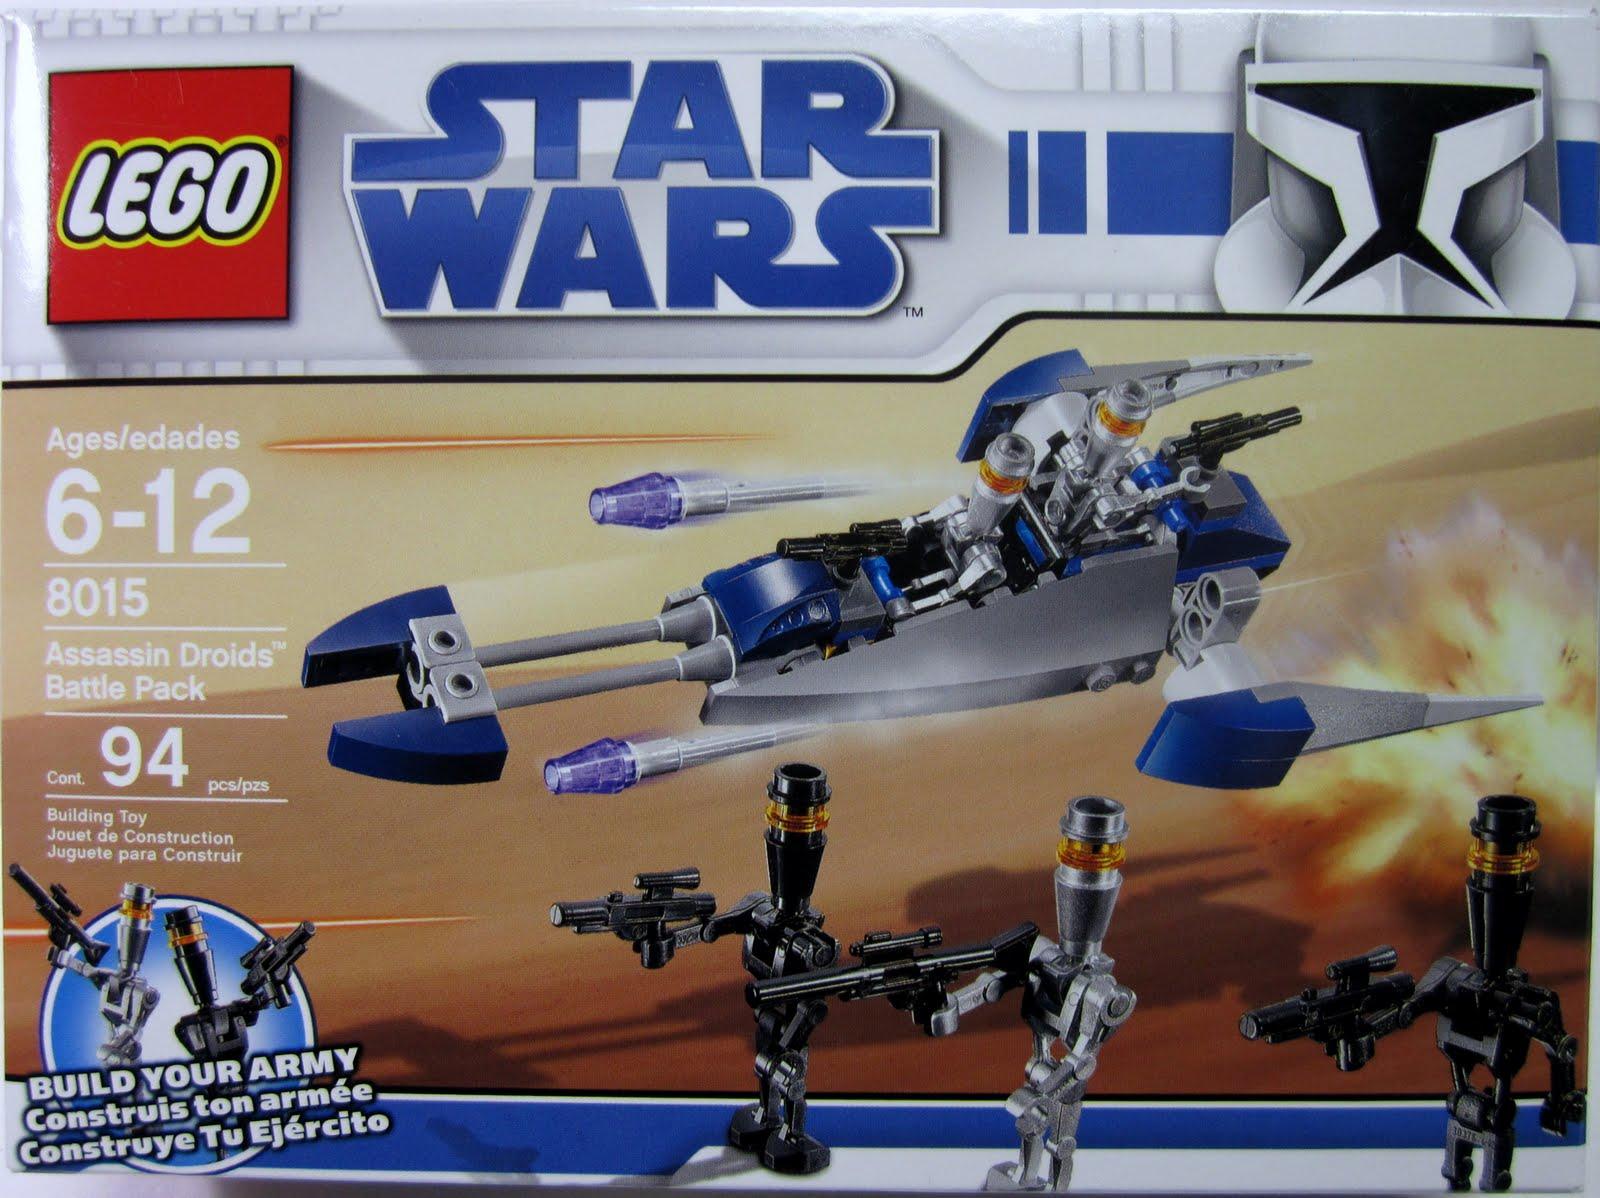 Lego Star Wars Assassin Droids Battle Pack set 8015